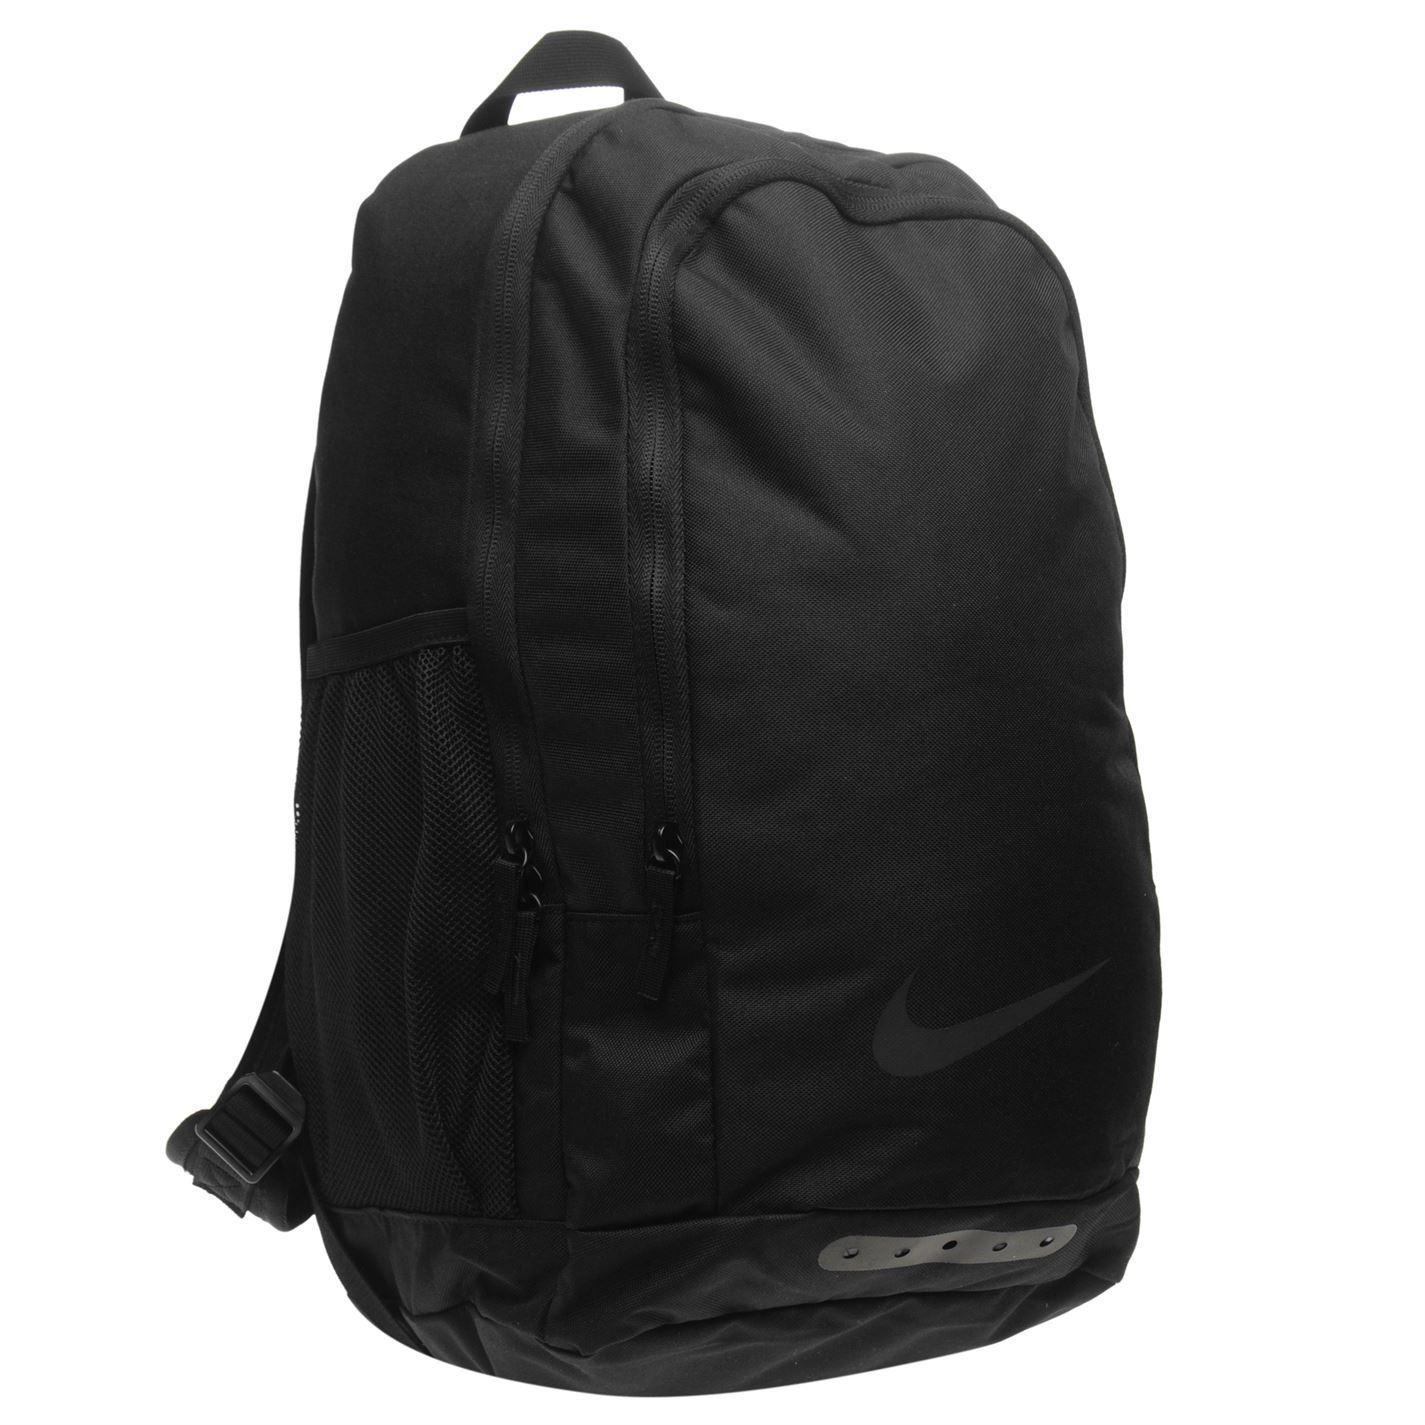 Nike Academy Backpack Black Sports Gym Bag Rucksack Carryall